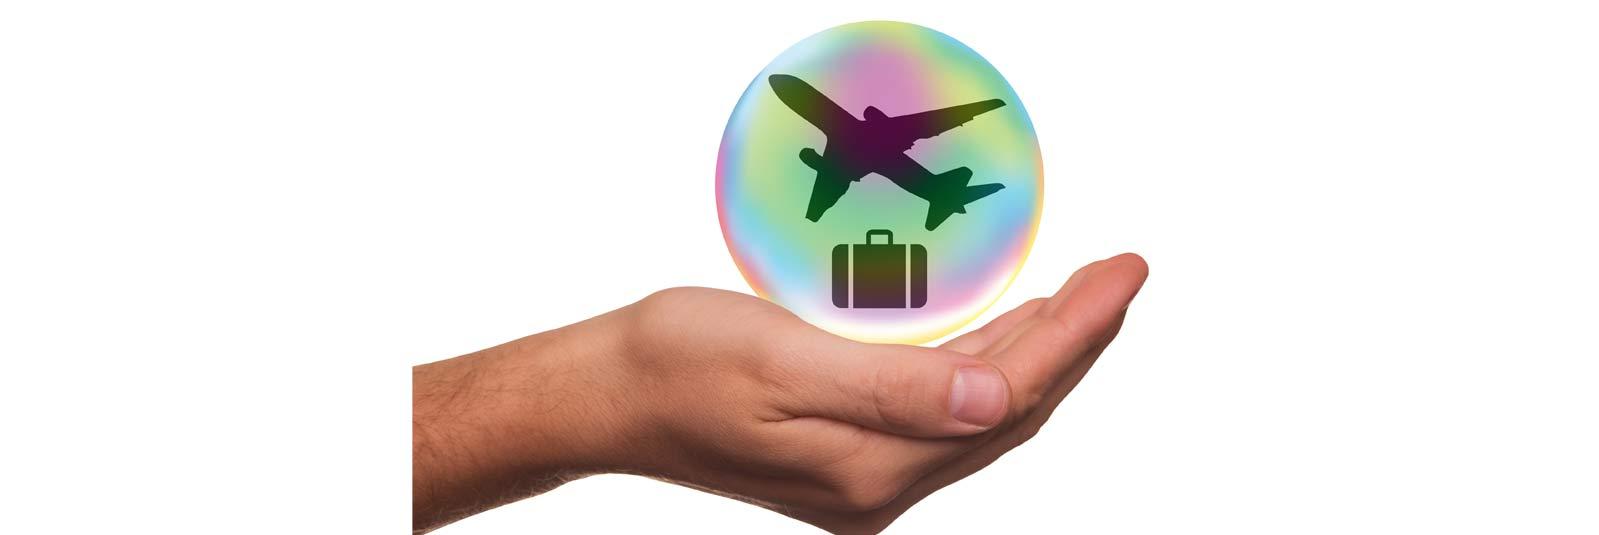 world-wide-travel-insurance.jpg